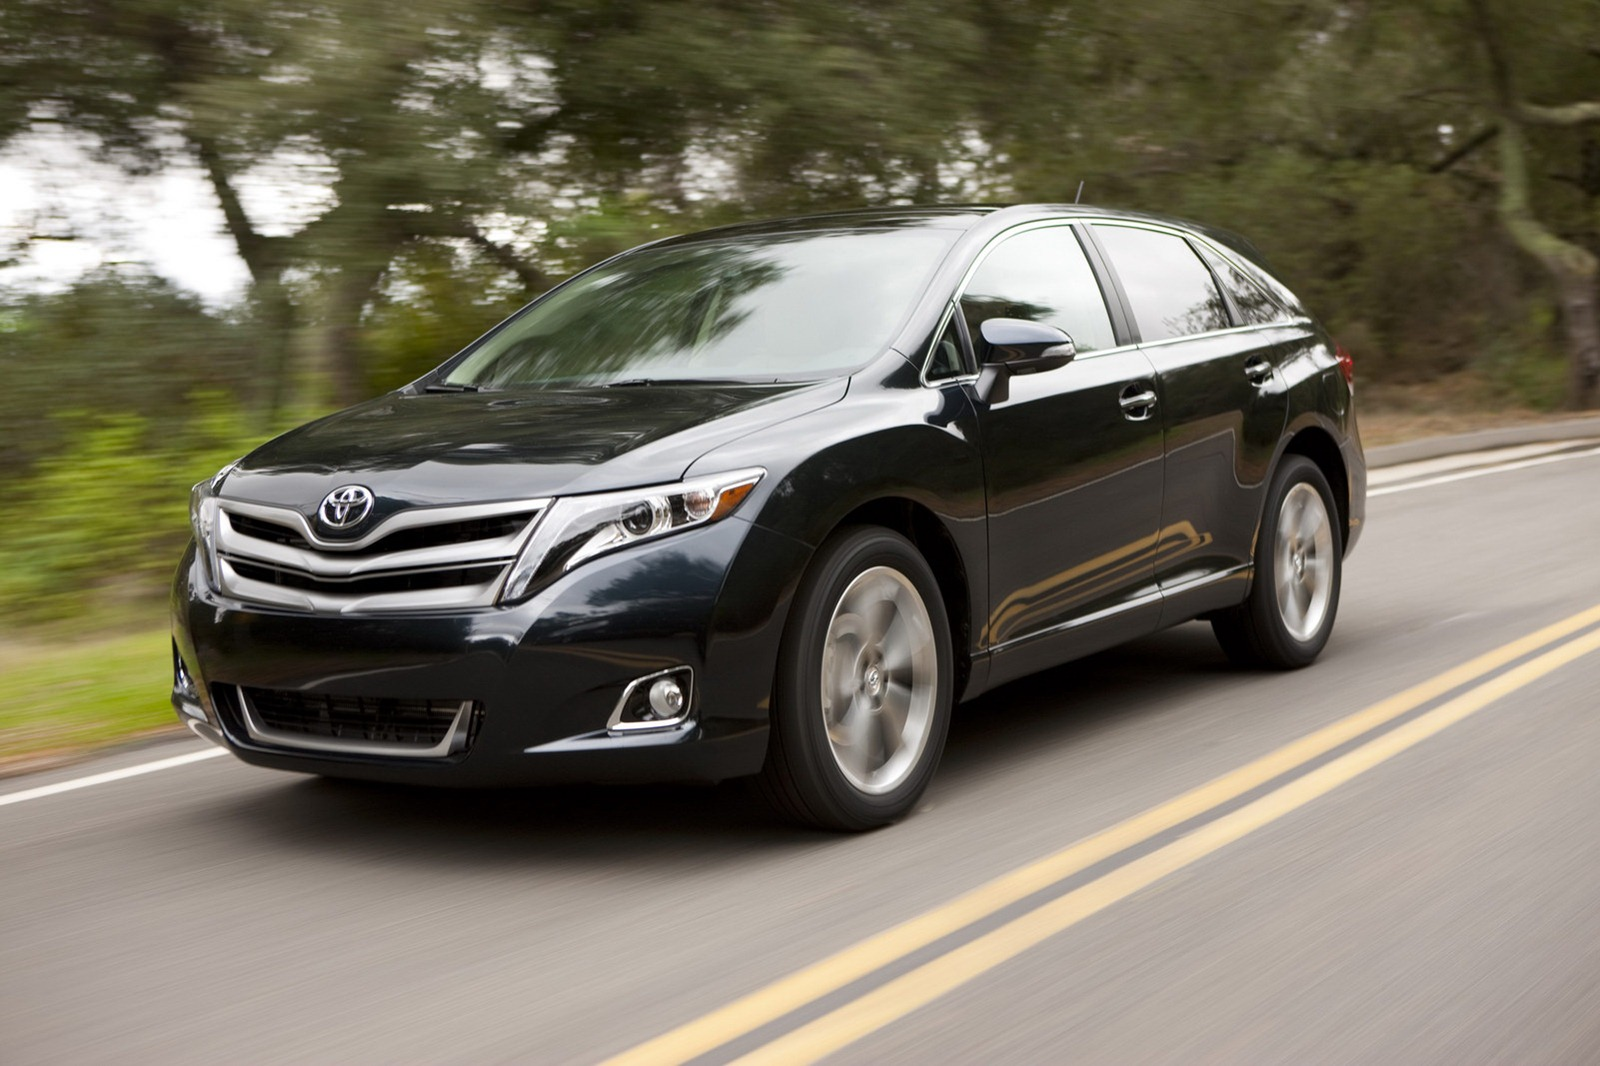 2015 Toyota Highlander Xle >> 2013 Toyota Venza Pricing Announced - autoevolution